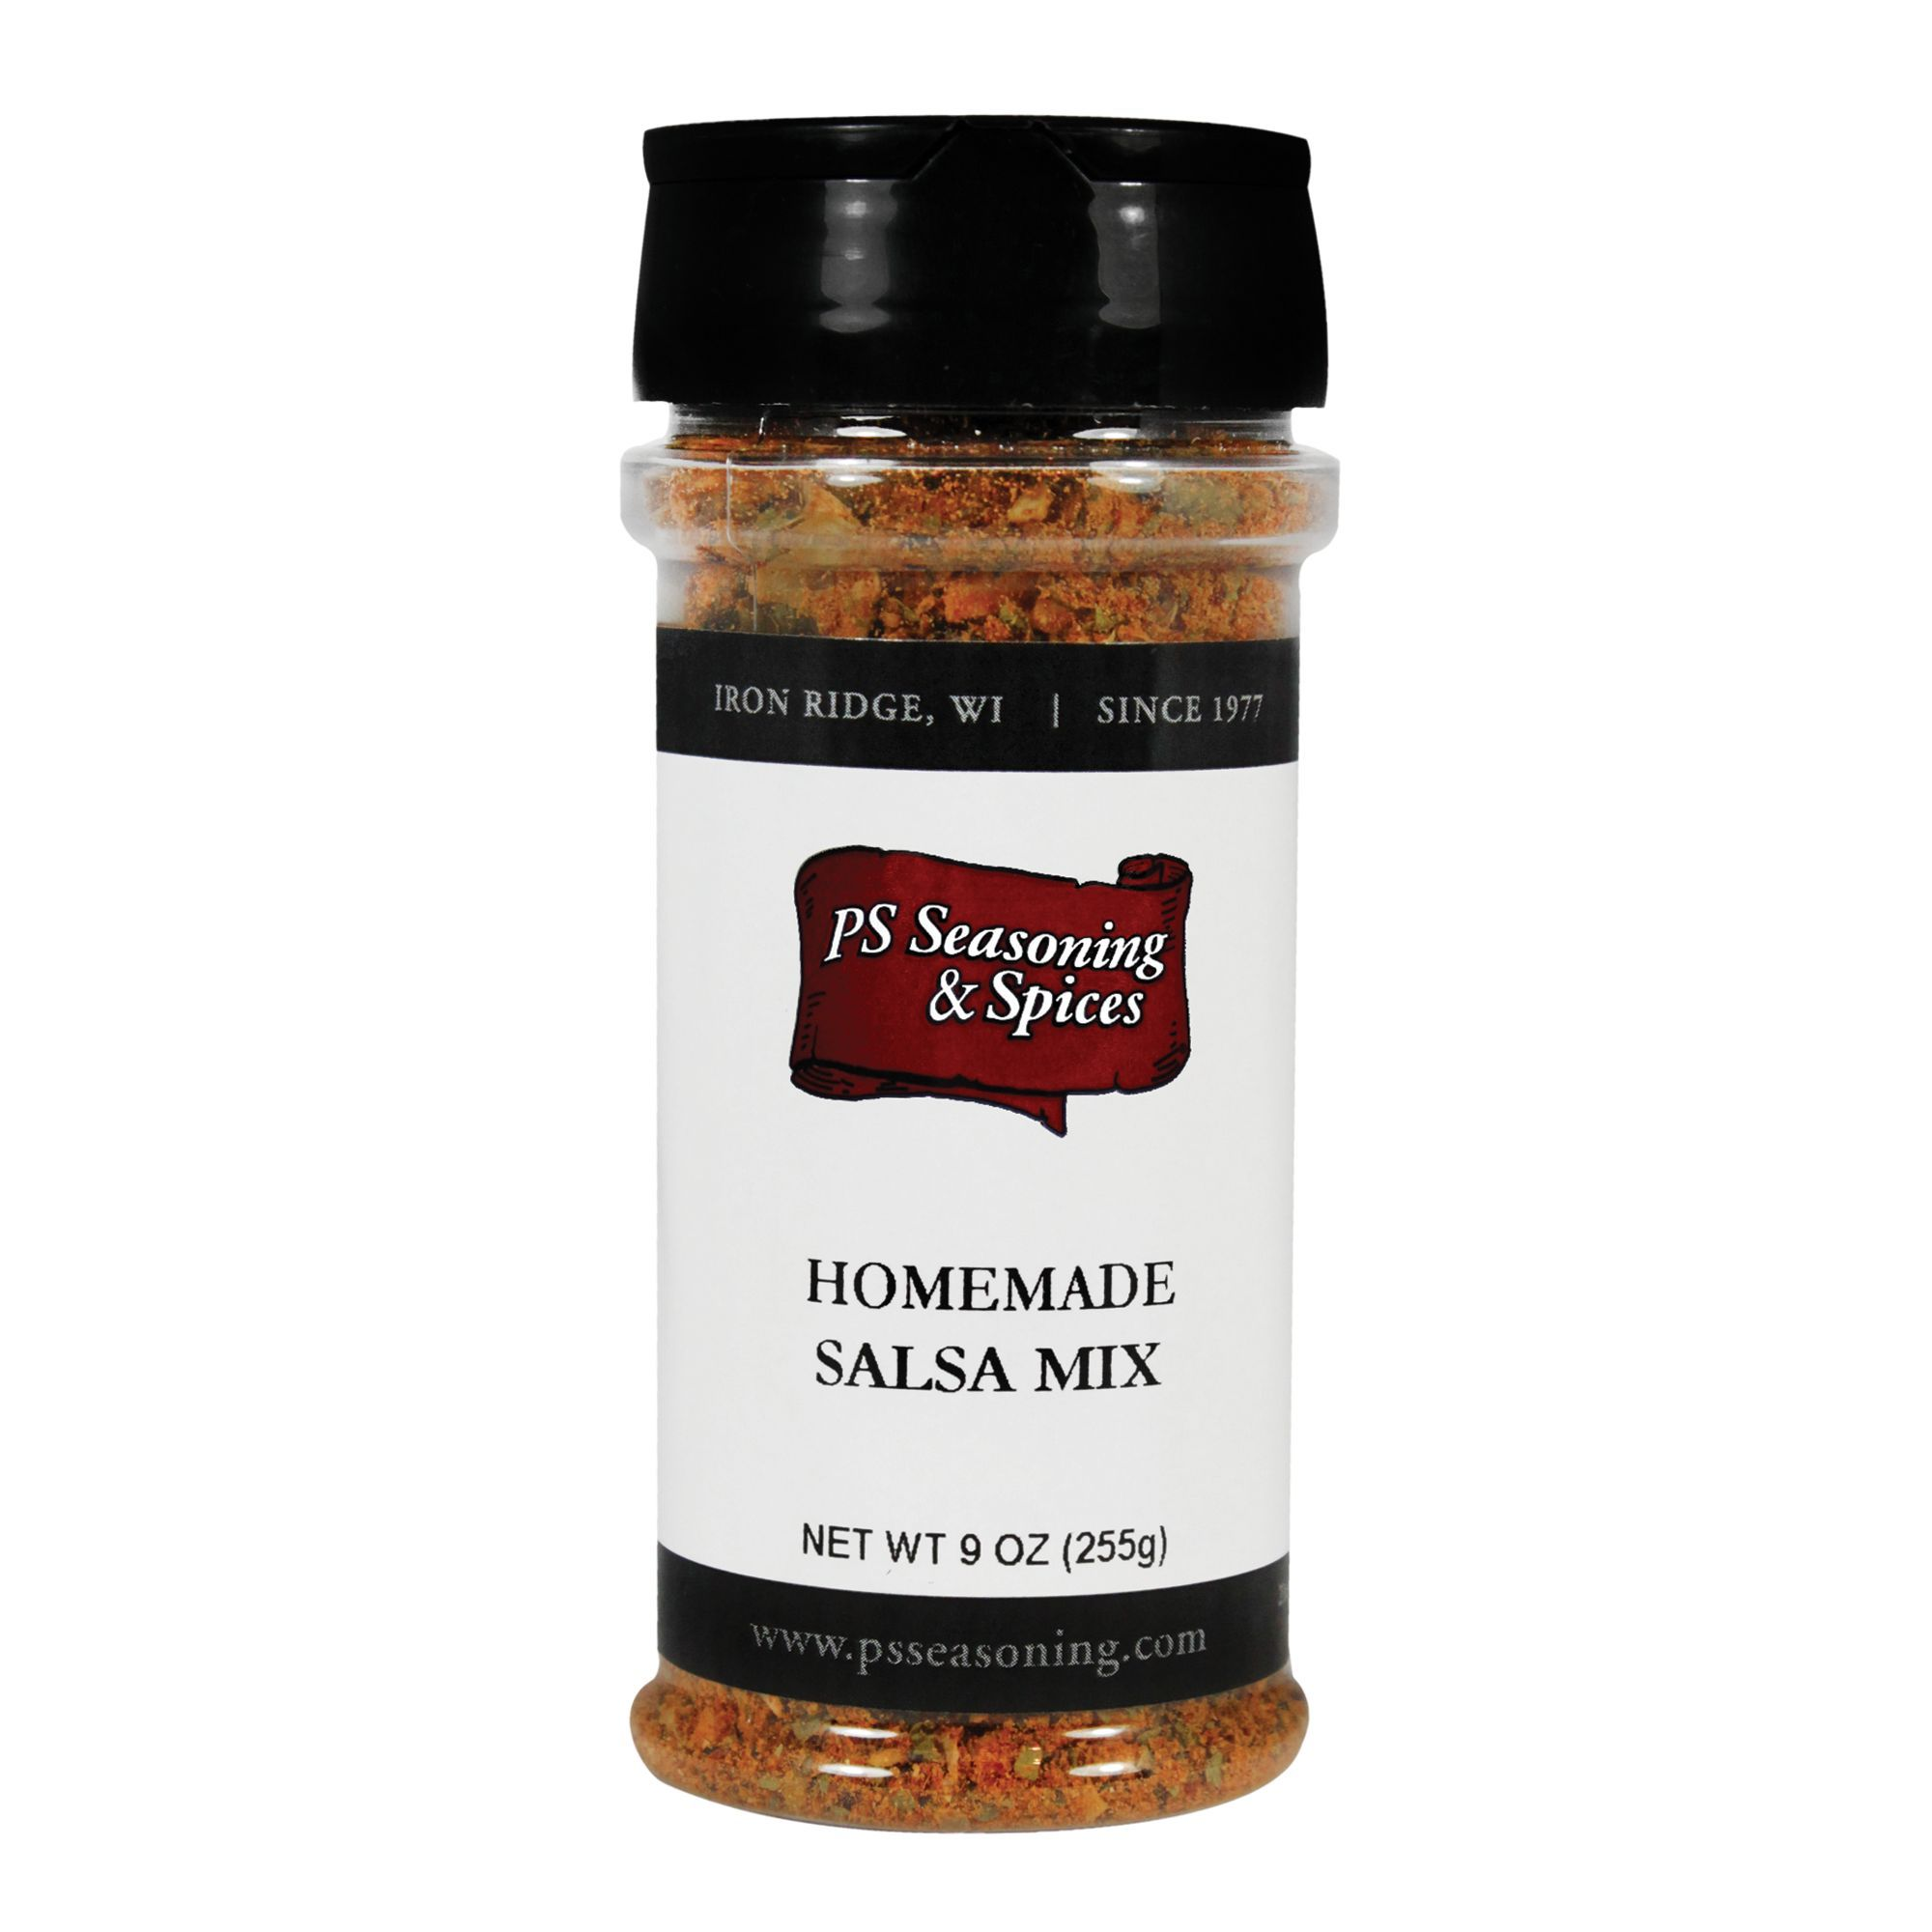 Homemade Salsa Mix | Homemade salsa, Salsa and Homemade